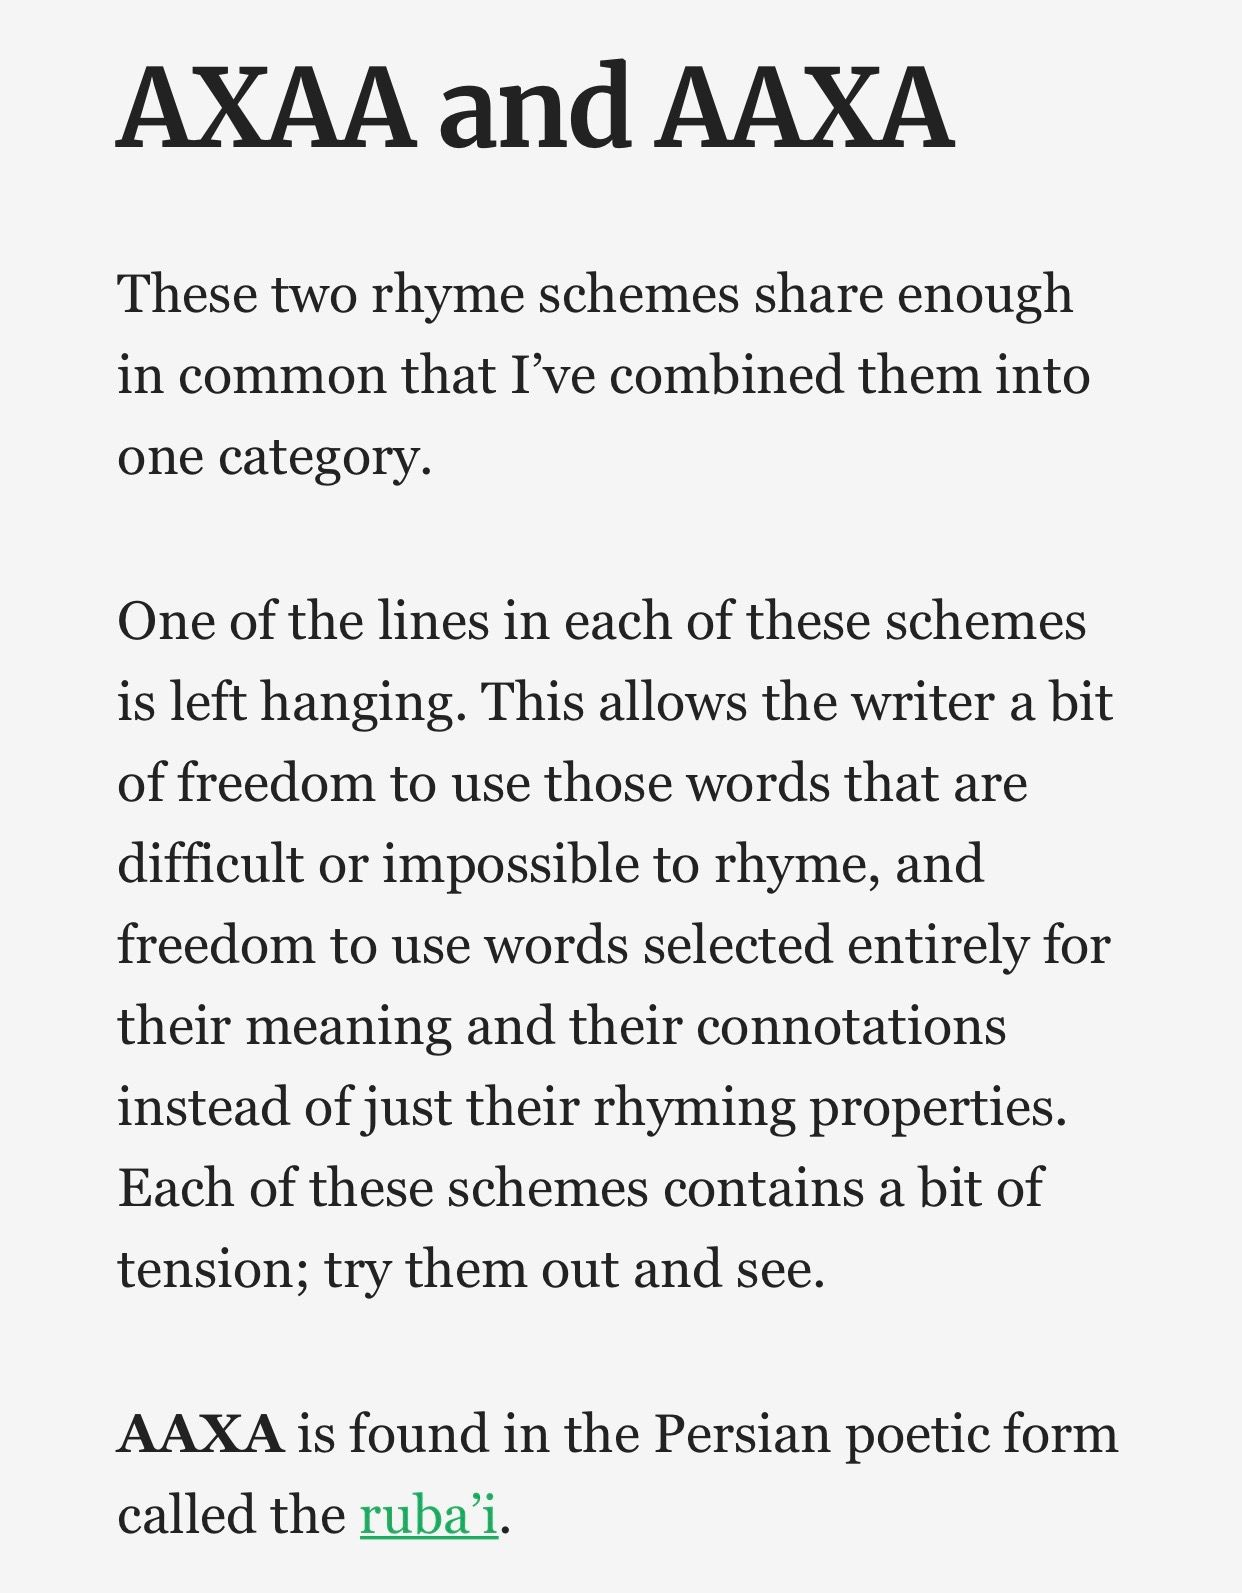 Pin by LEF on Wax Poetic | Rhyme scheme, Words, Waxing poetic